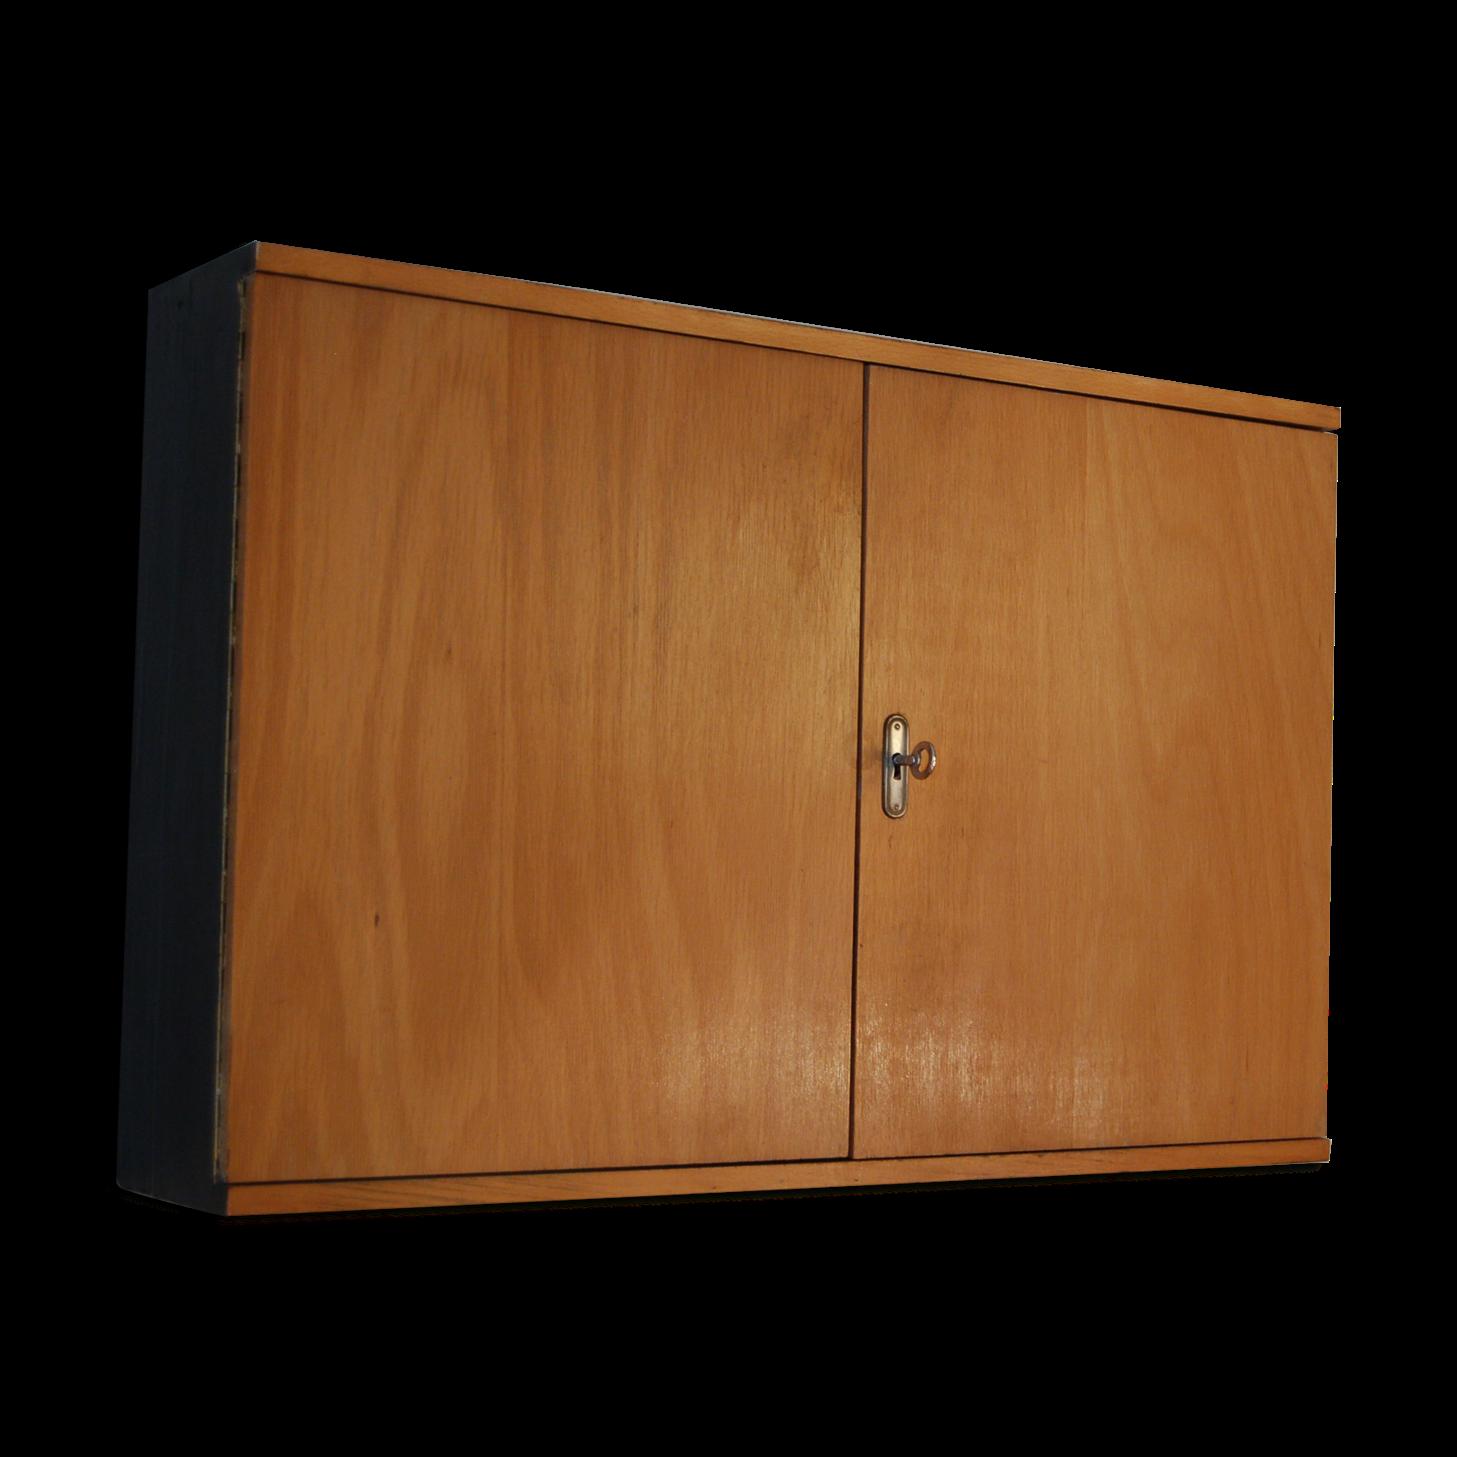 vintage 60s furniture. Closet Wall Early 60s Furniture Storage Vintage Beech Toolbox - Wood Brown VrNwJVY